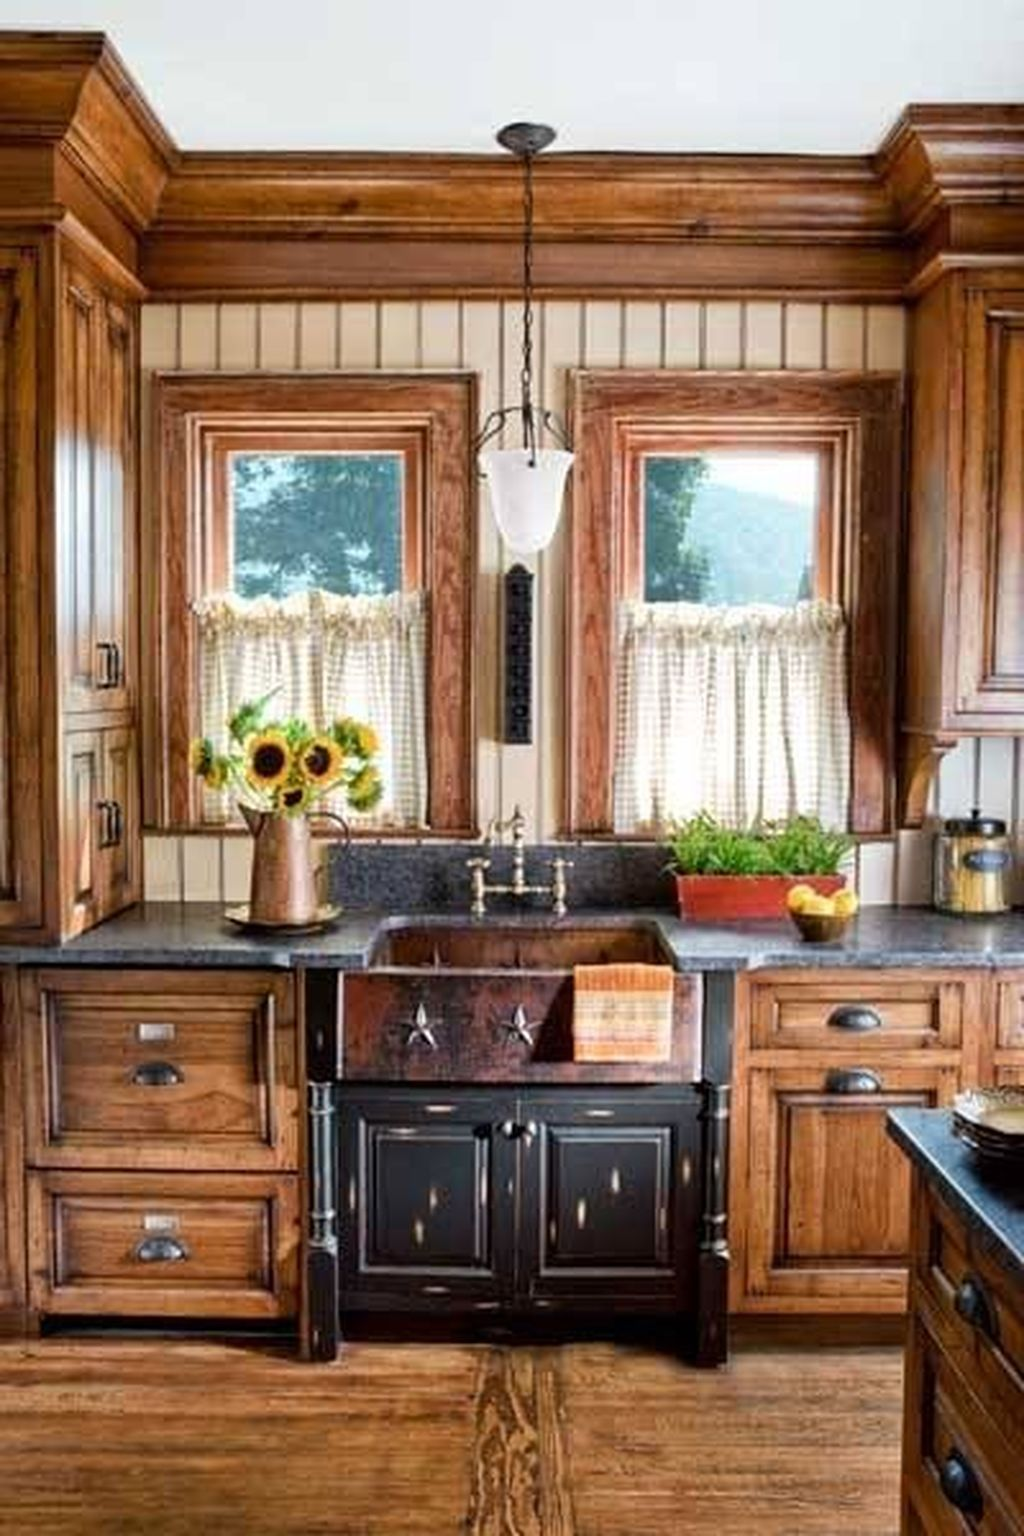 34 The Best Farmhouse Kitchen Sink Ideas   Farmhouse kitchen sinks ...